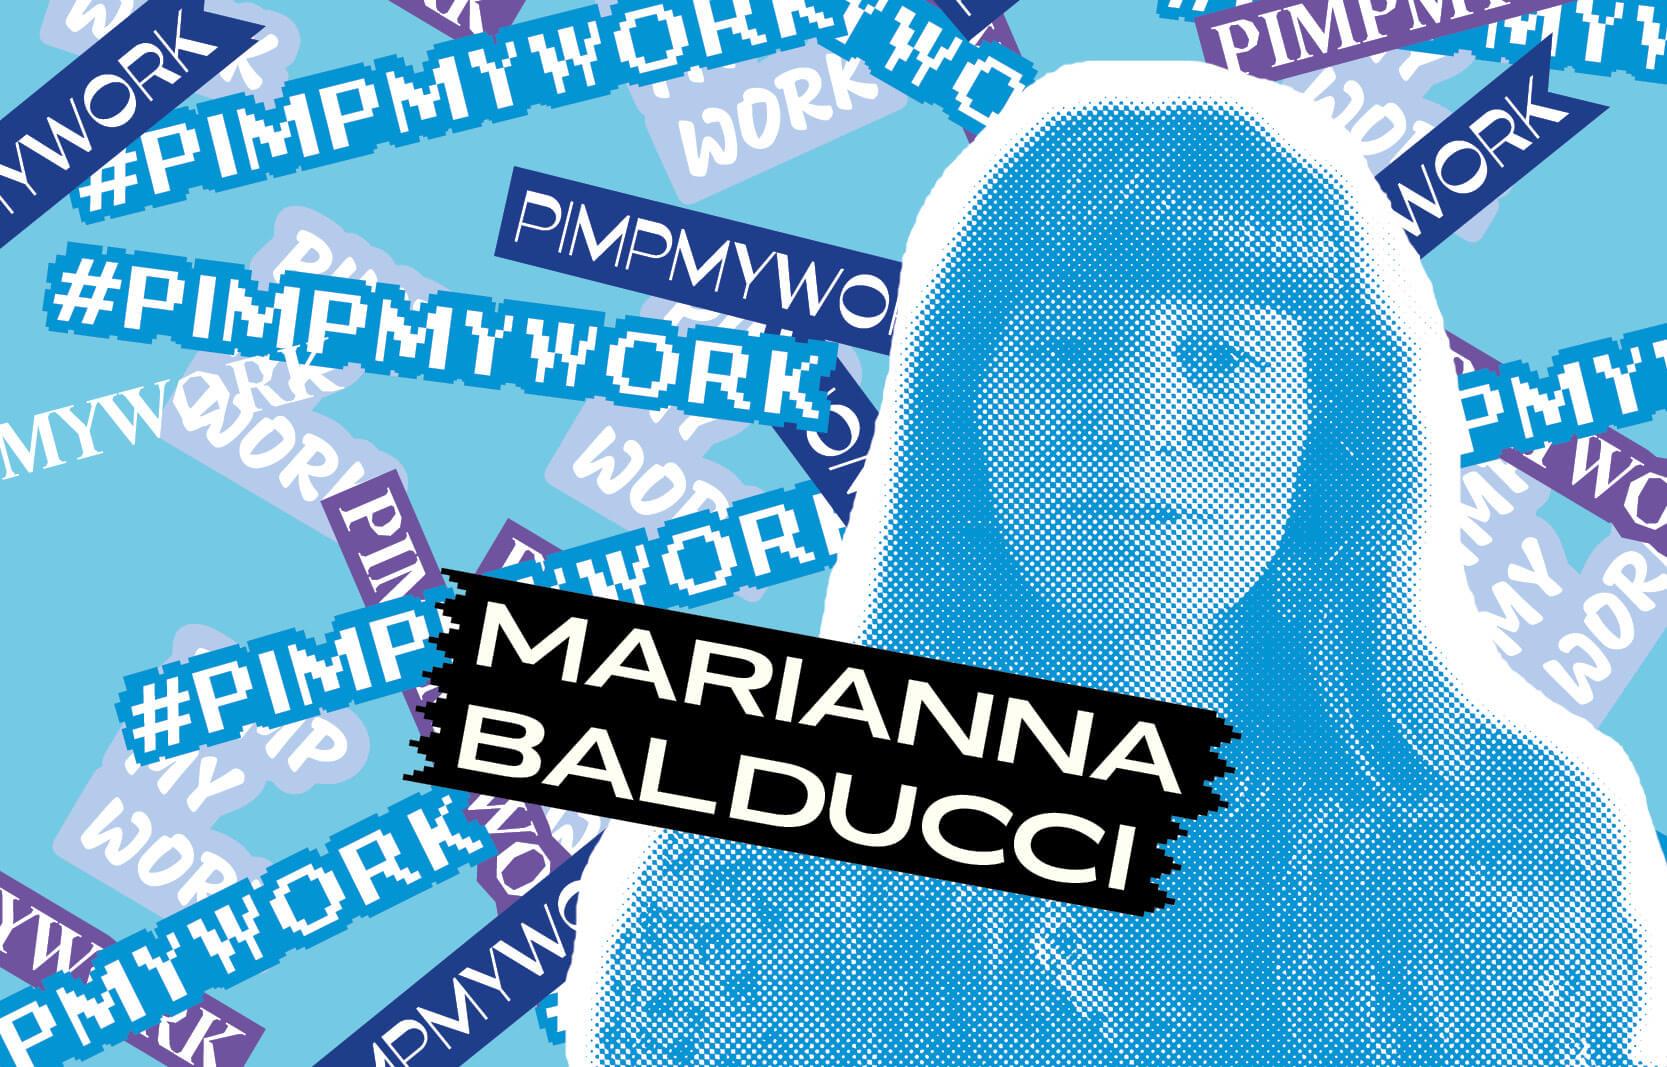 Marianna Balducci